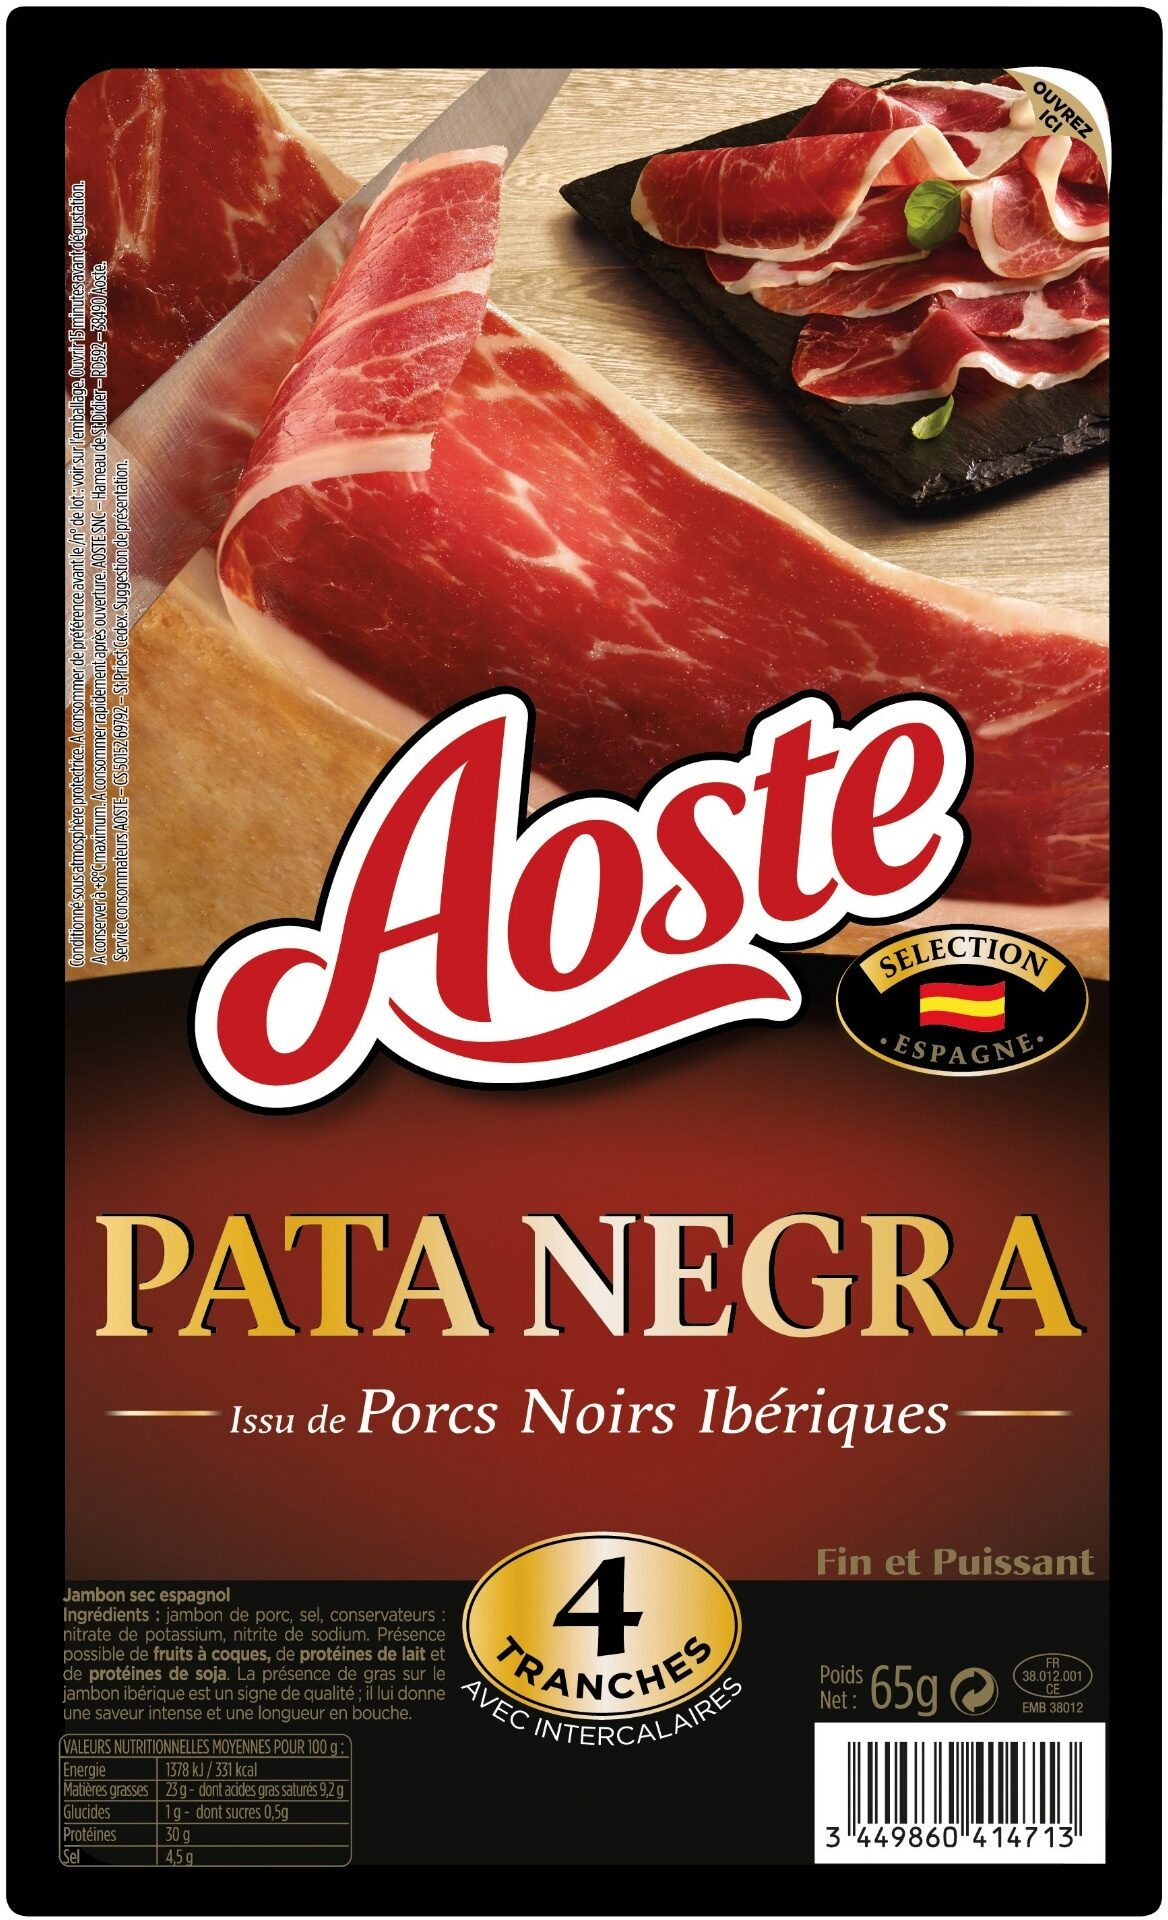 Pata Negra - Aoste - Produit - fr